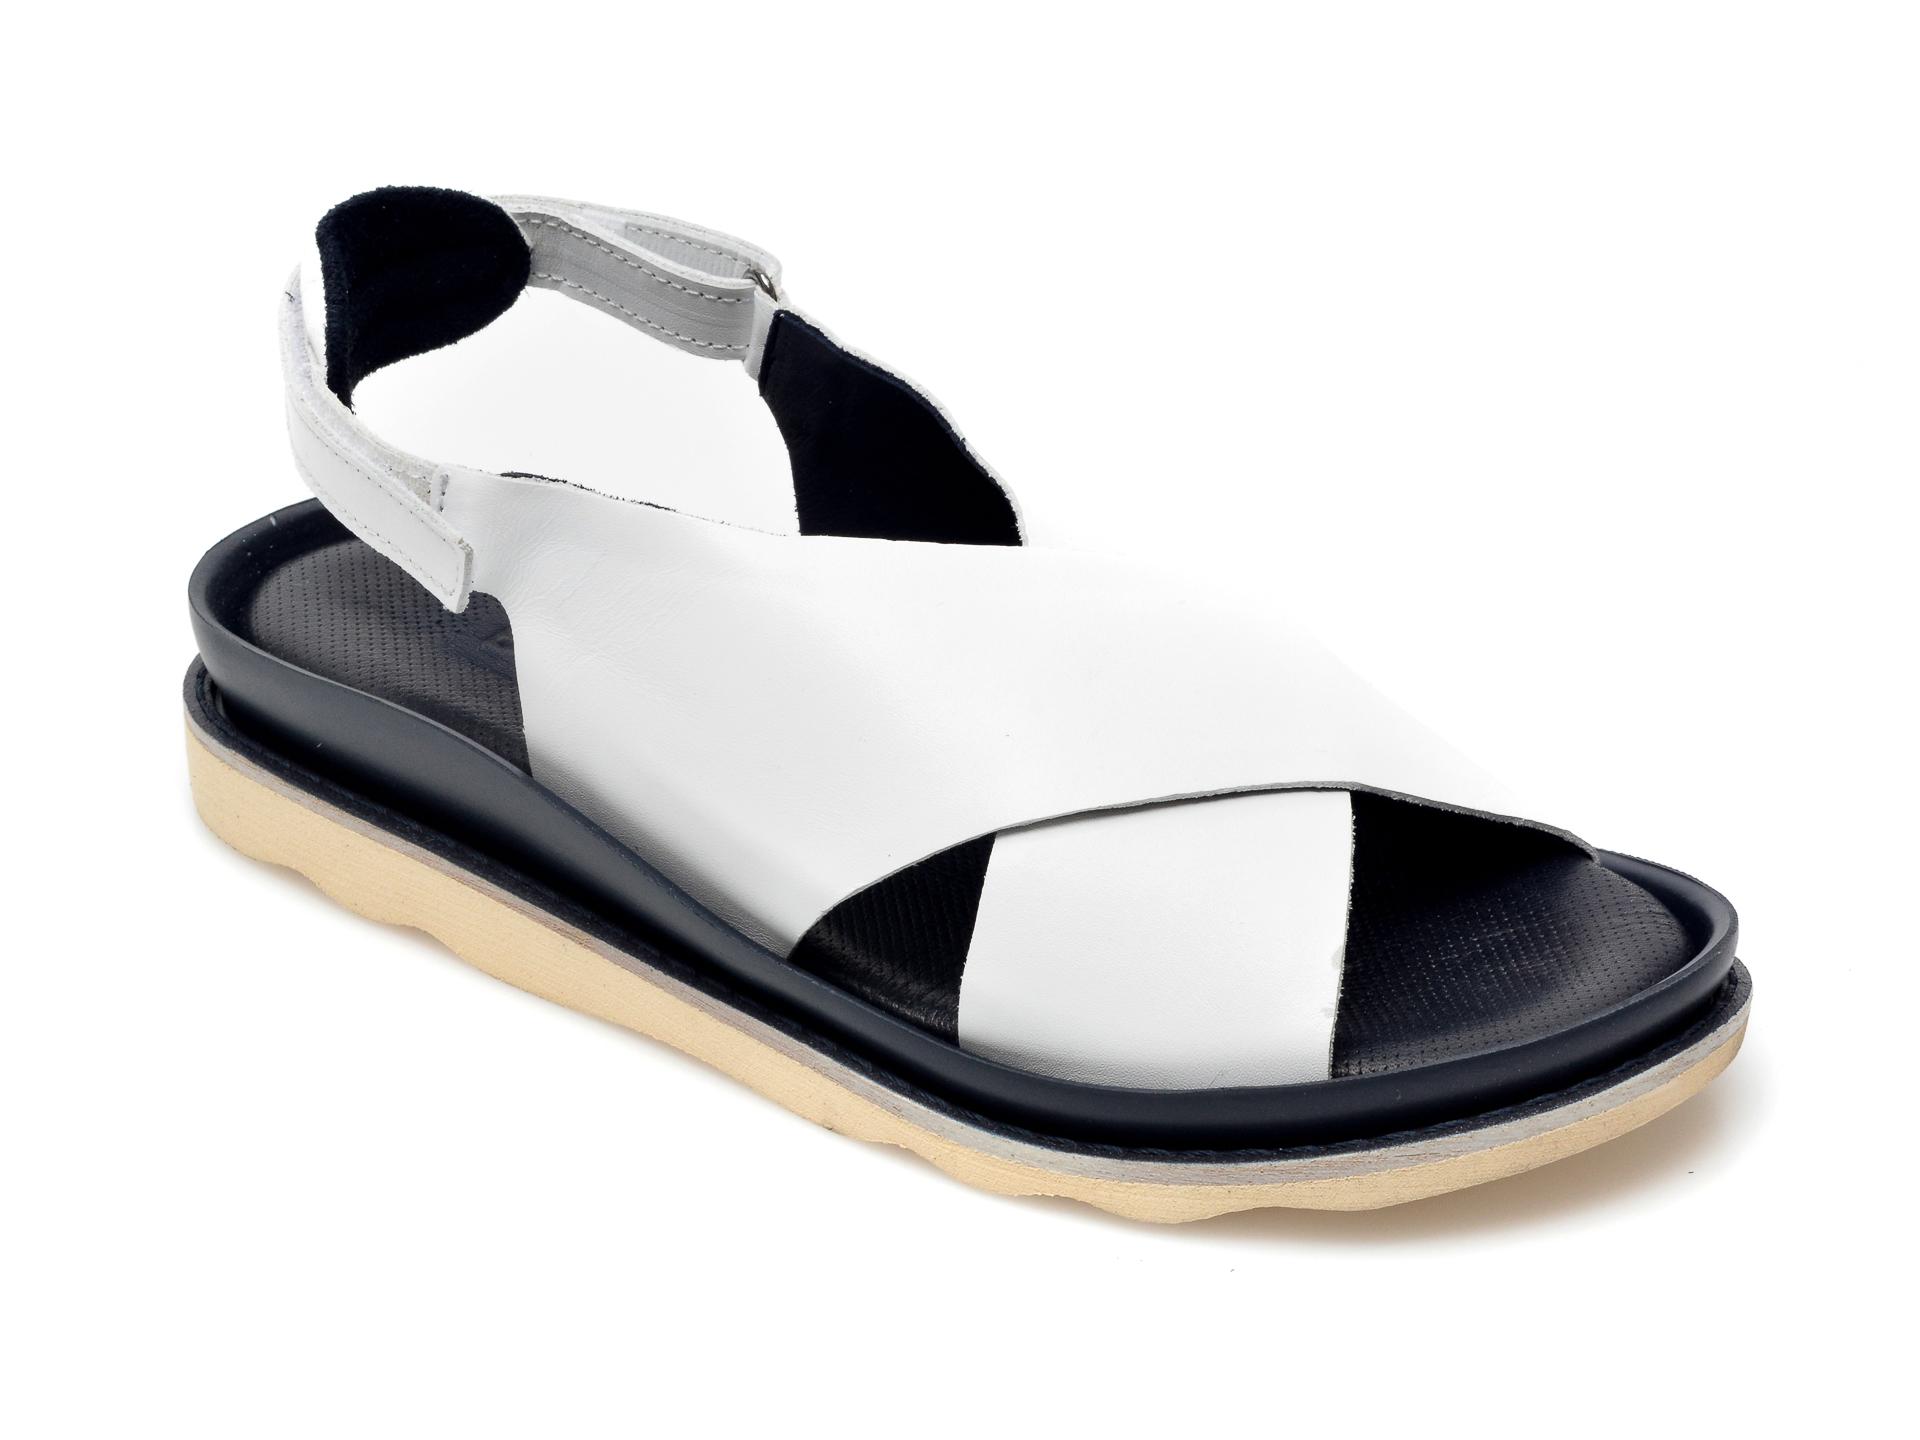 Sandale BABOOS albe, 403, din piele naturala imagine otter.ro 2021